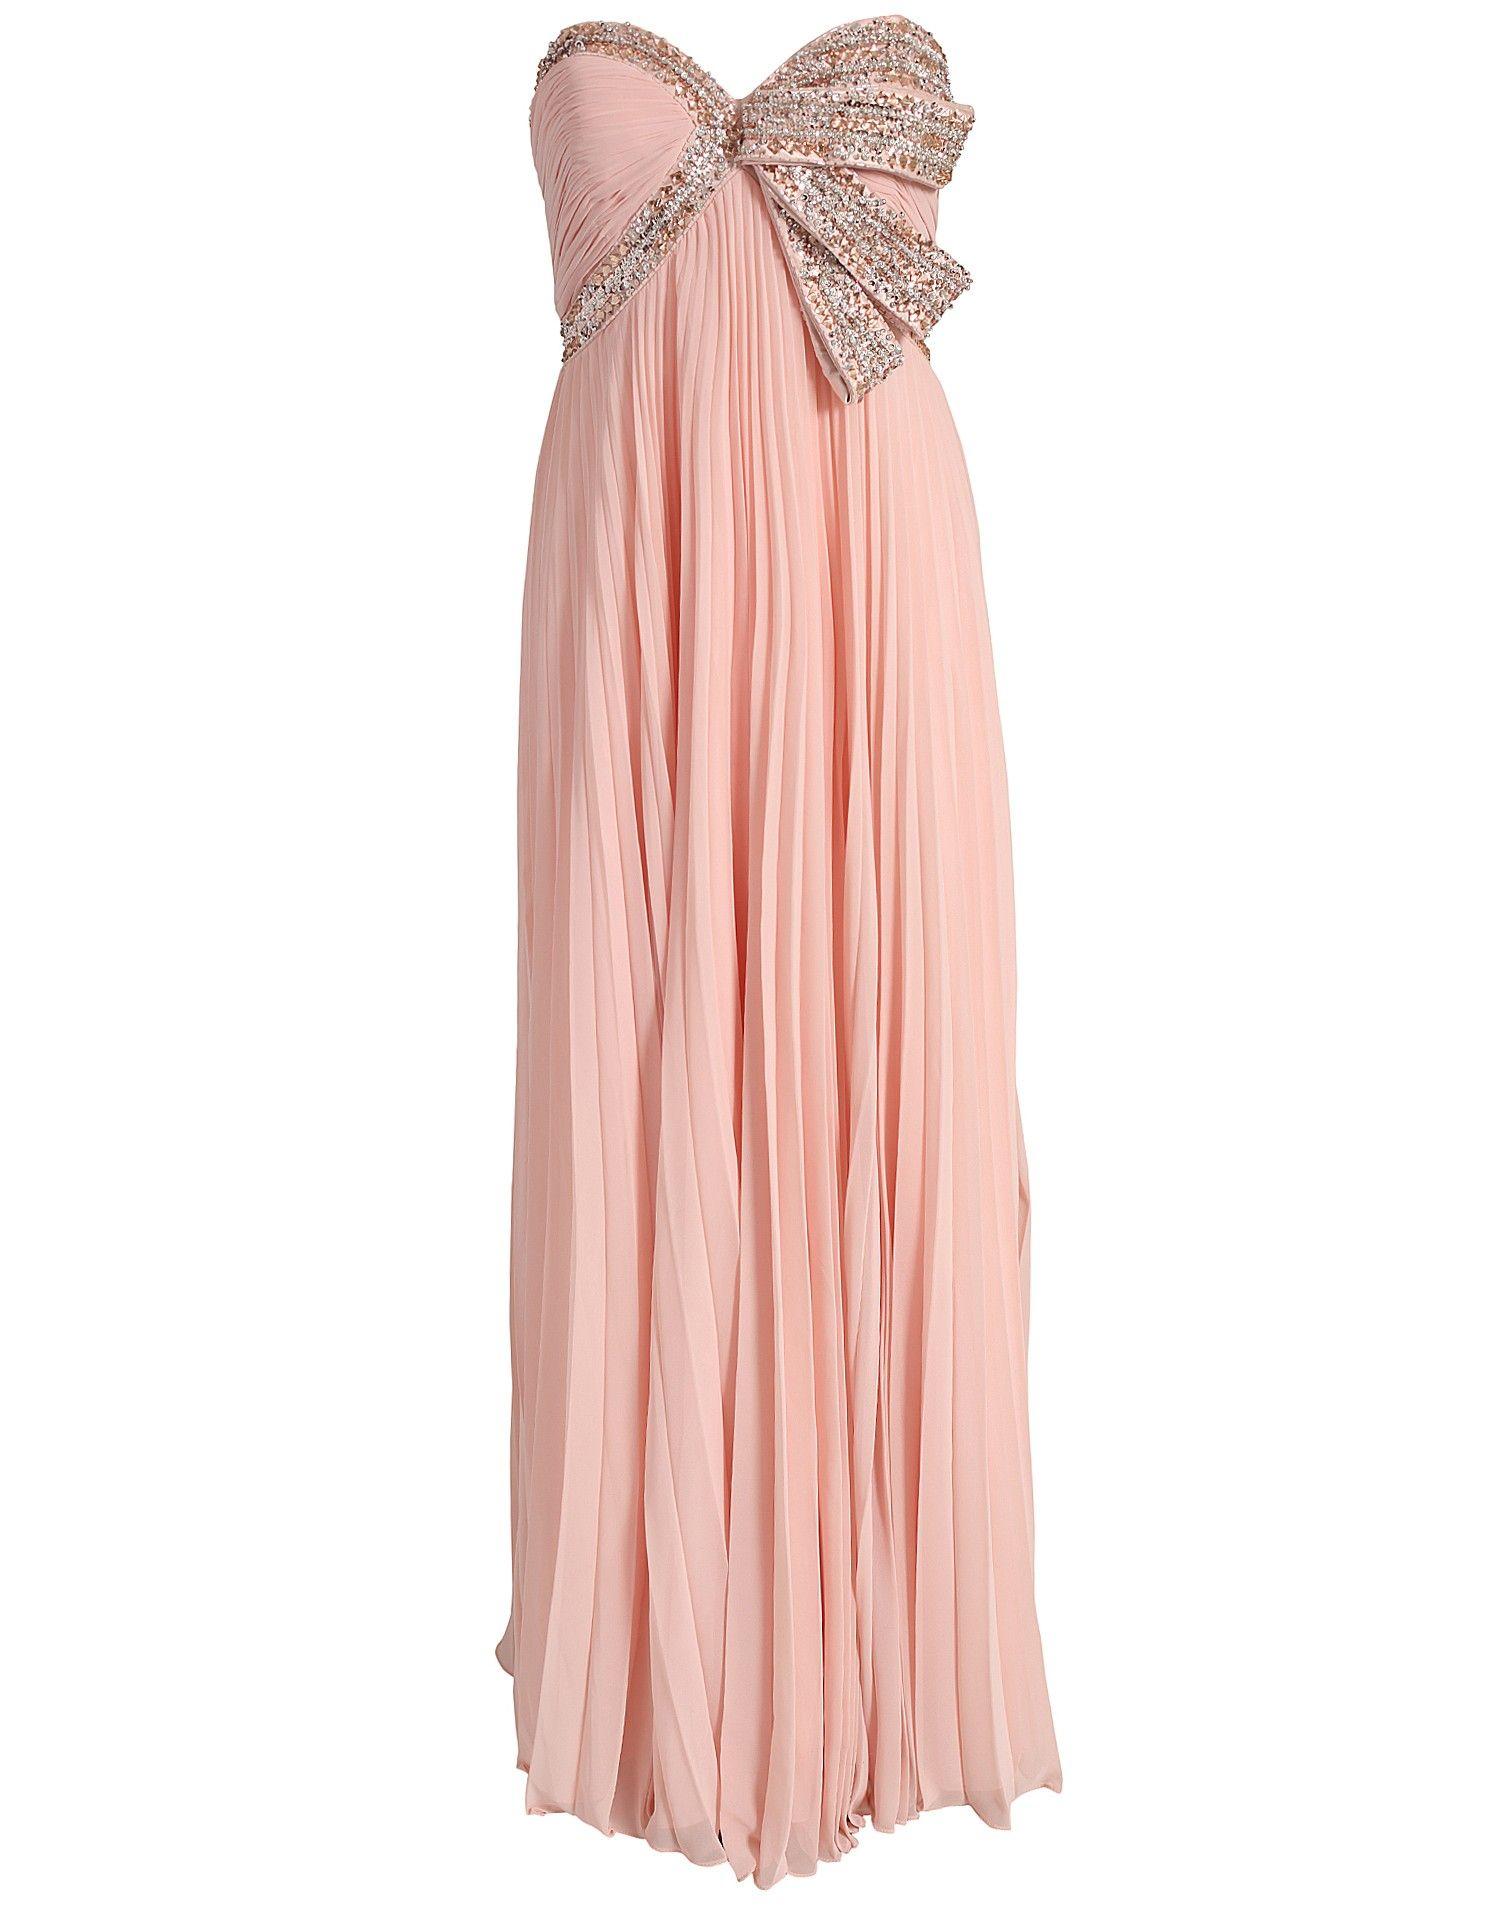 Vivian Dress from Forever Unique